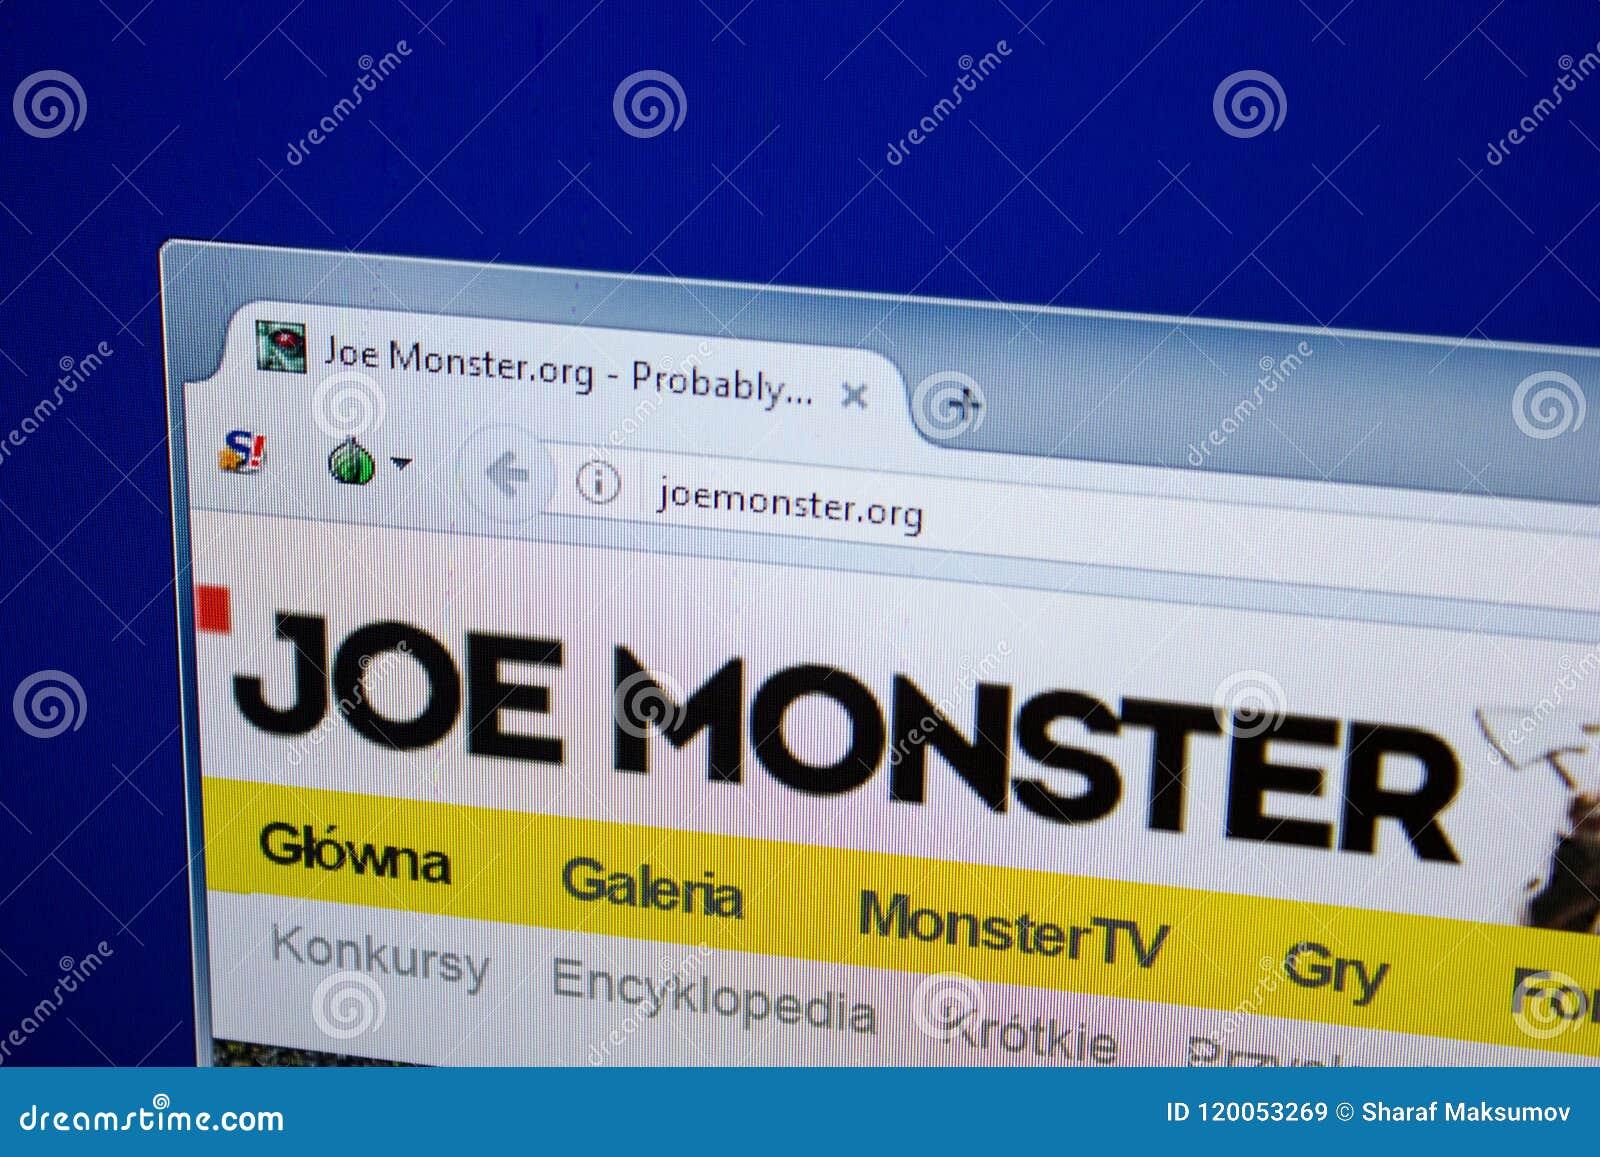 Ryazan, Ρωσία - 26 Ιουνίου 2018: Αρχική σελίδα του ιστοχώρου JoeMonster στην επίδειξη του PC URL - JoeMonster org